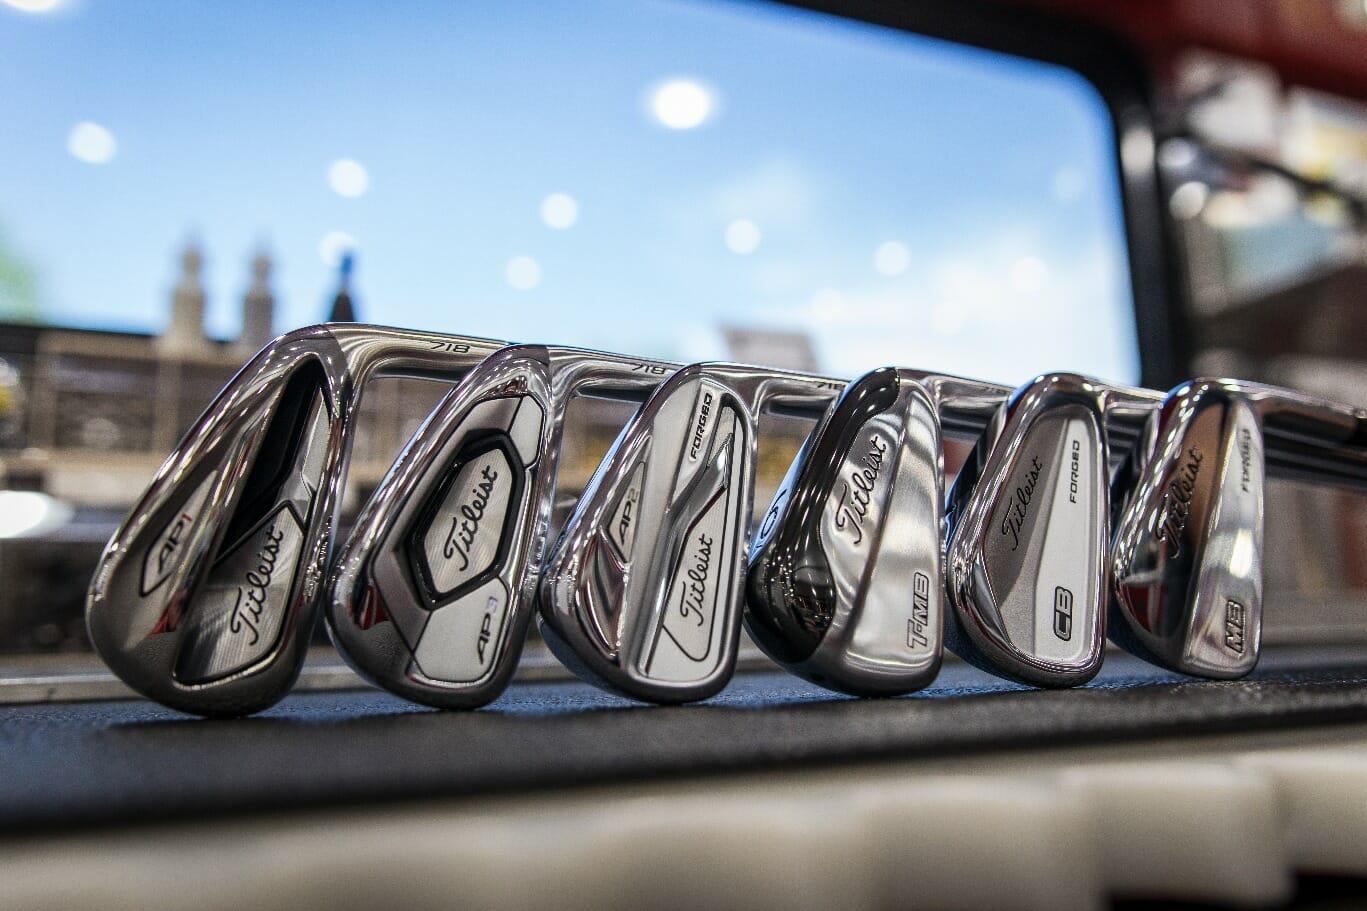 Prototype Titleist 718 Irons hit tours this week | Irish Golfer News